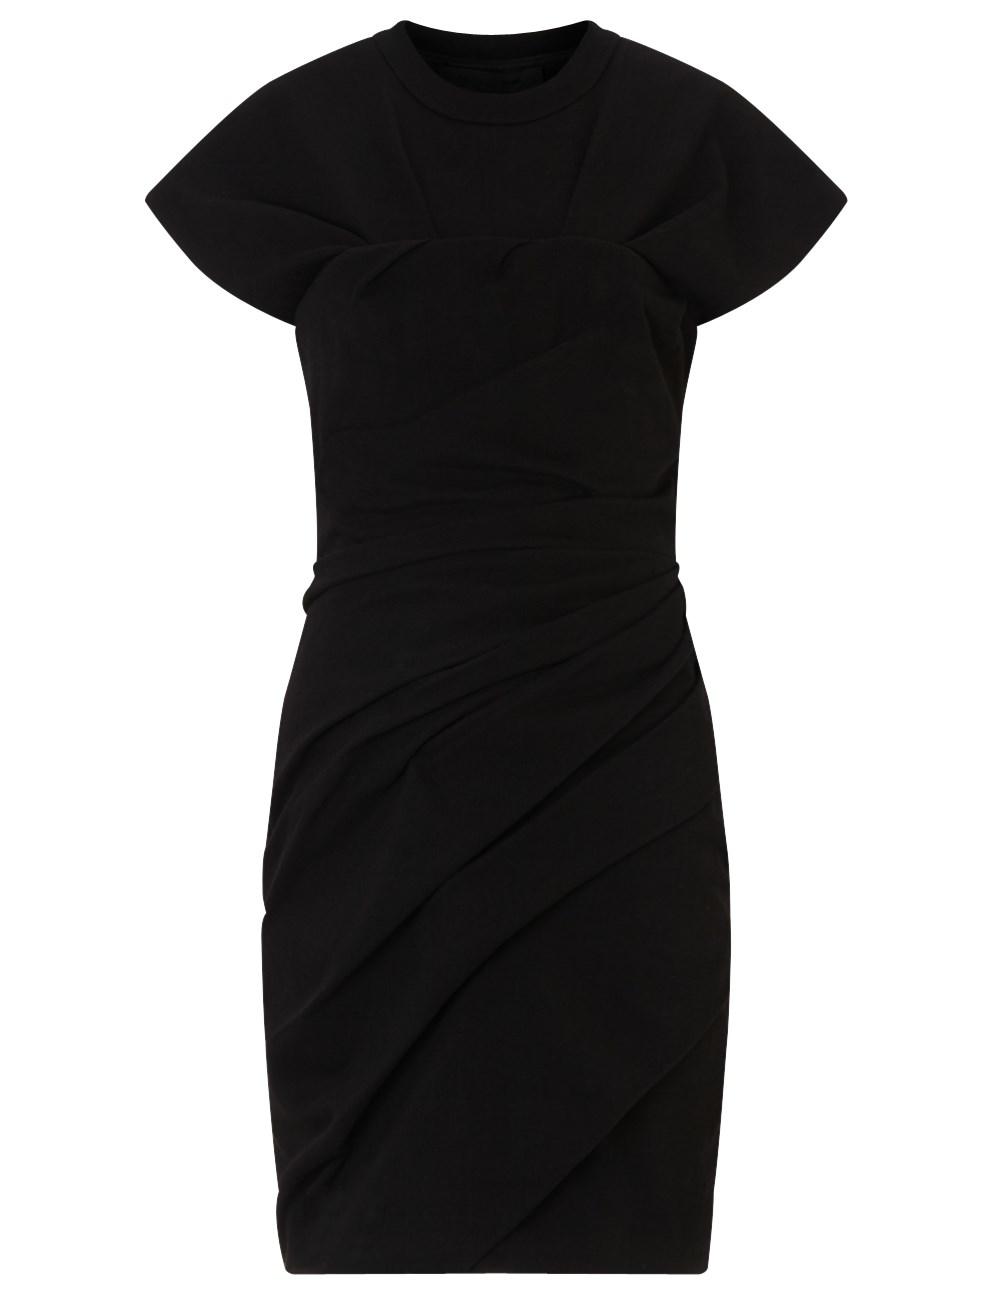 Alexander wang Black Cotton T-shirt Mini Dress in Black - Lyst